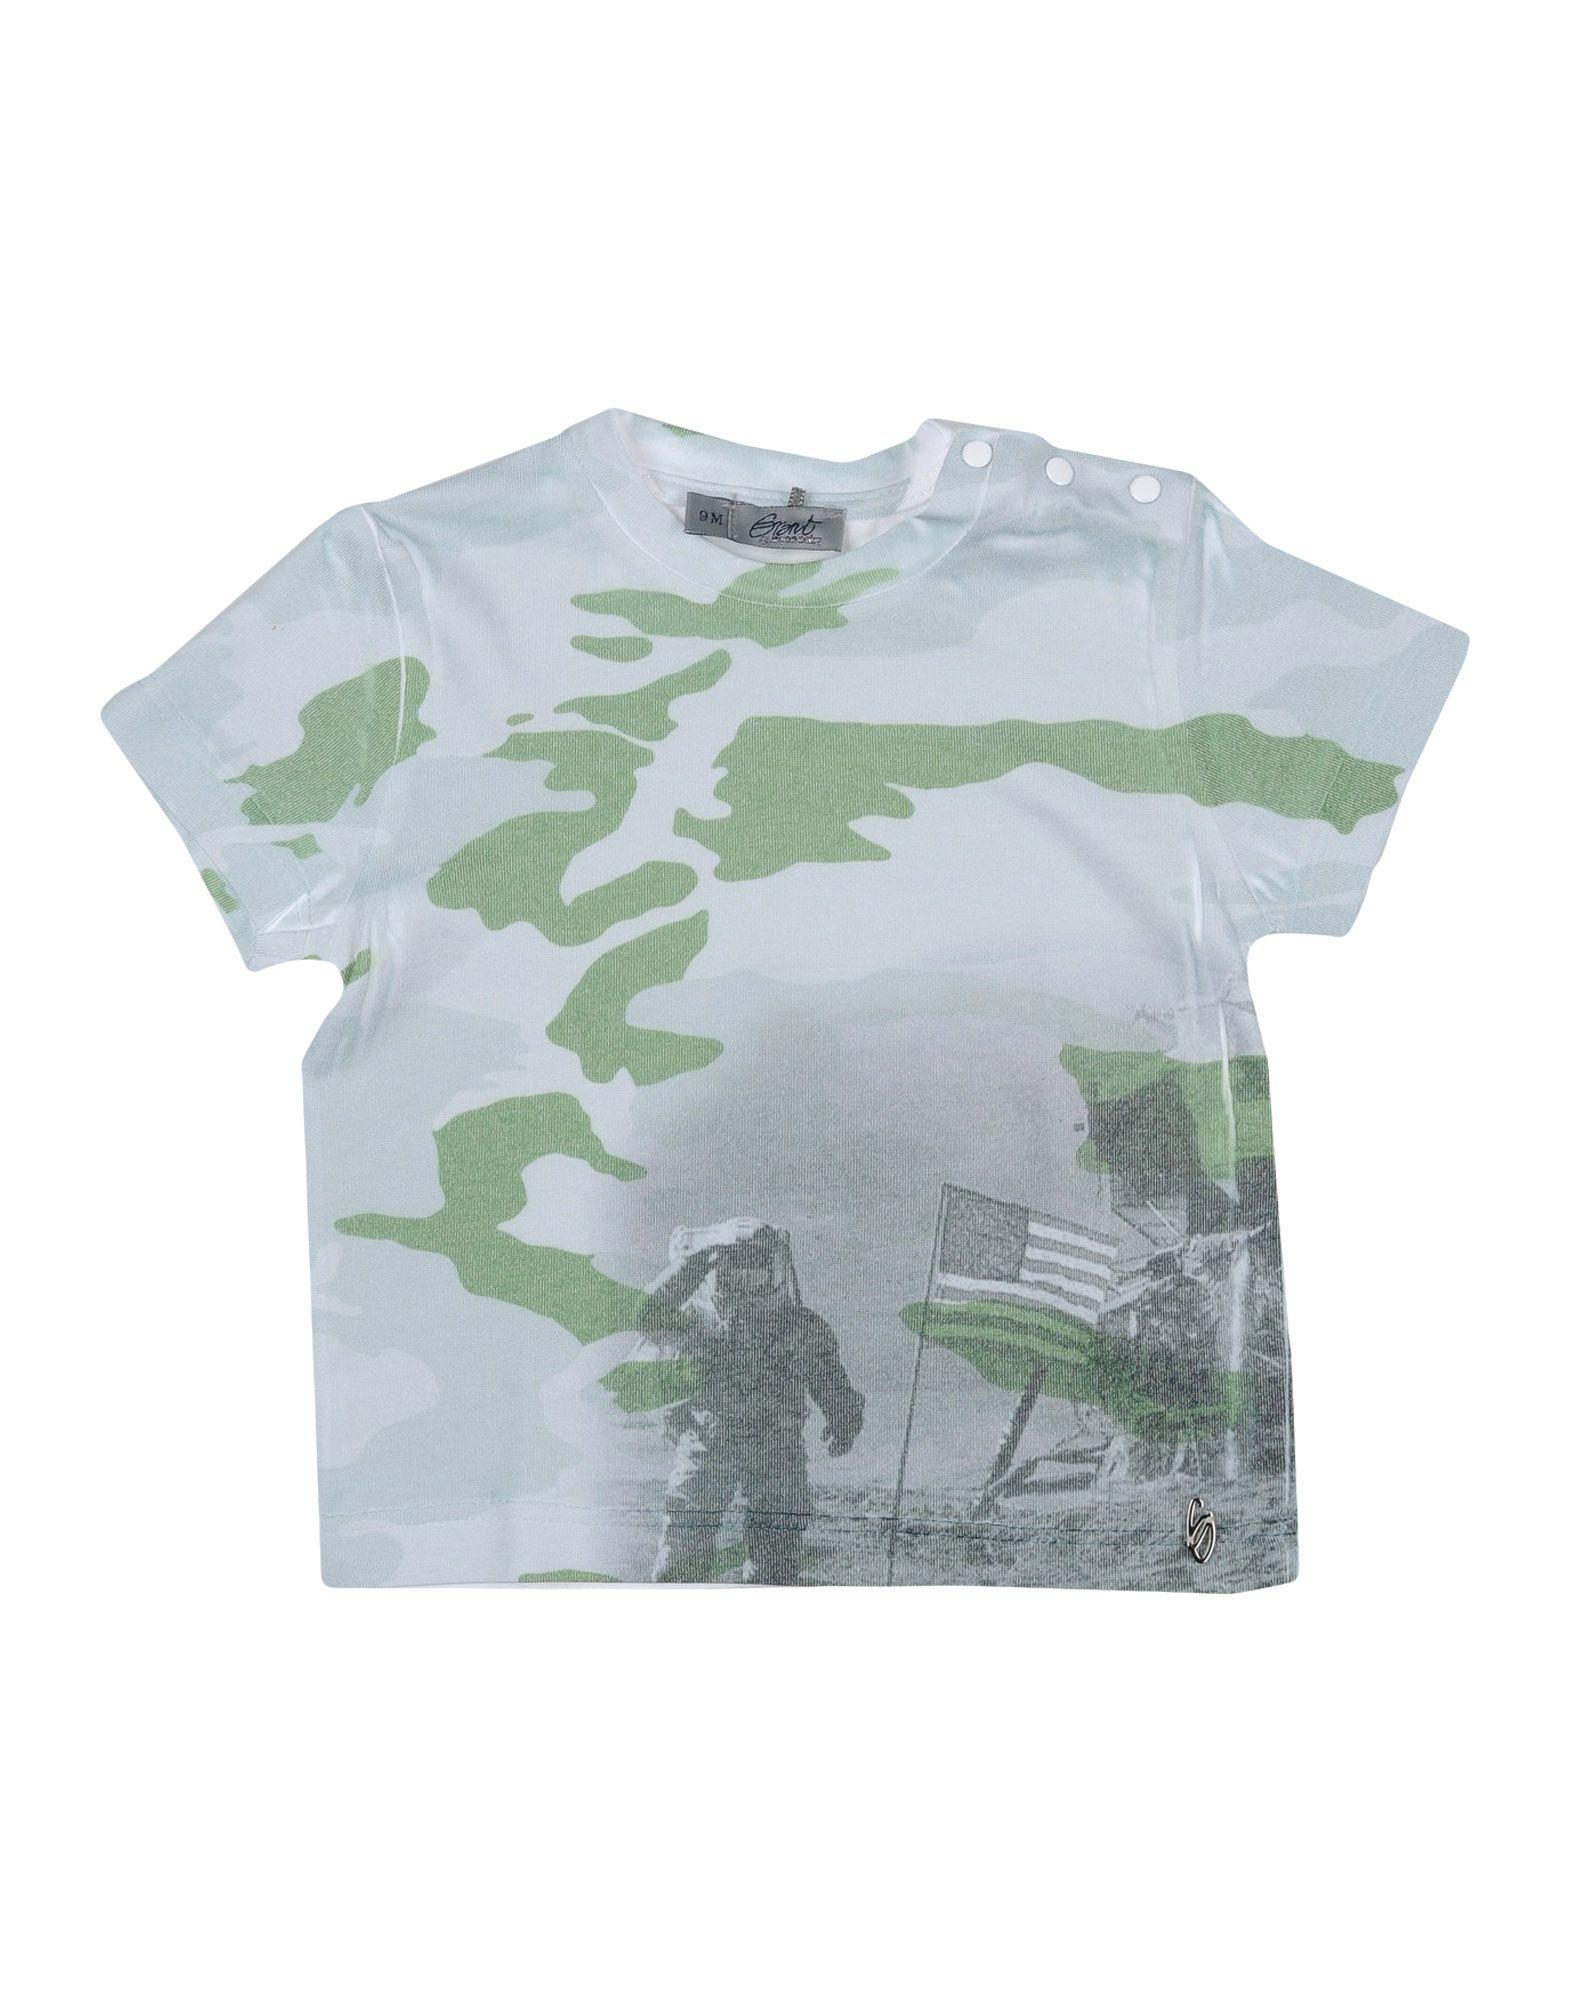 Grant Garçon Baby Kids' T-shirts In Green